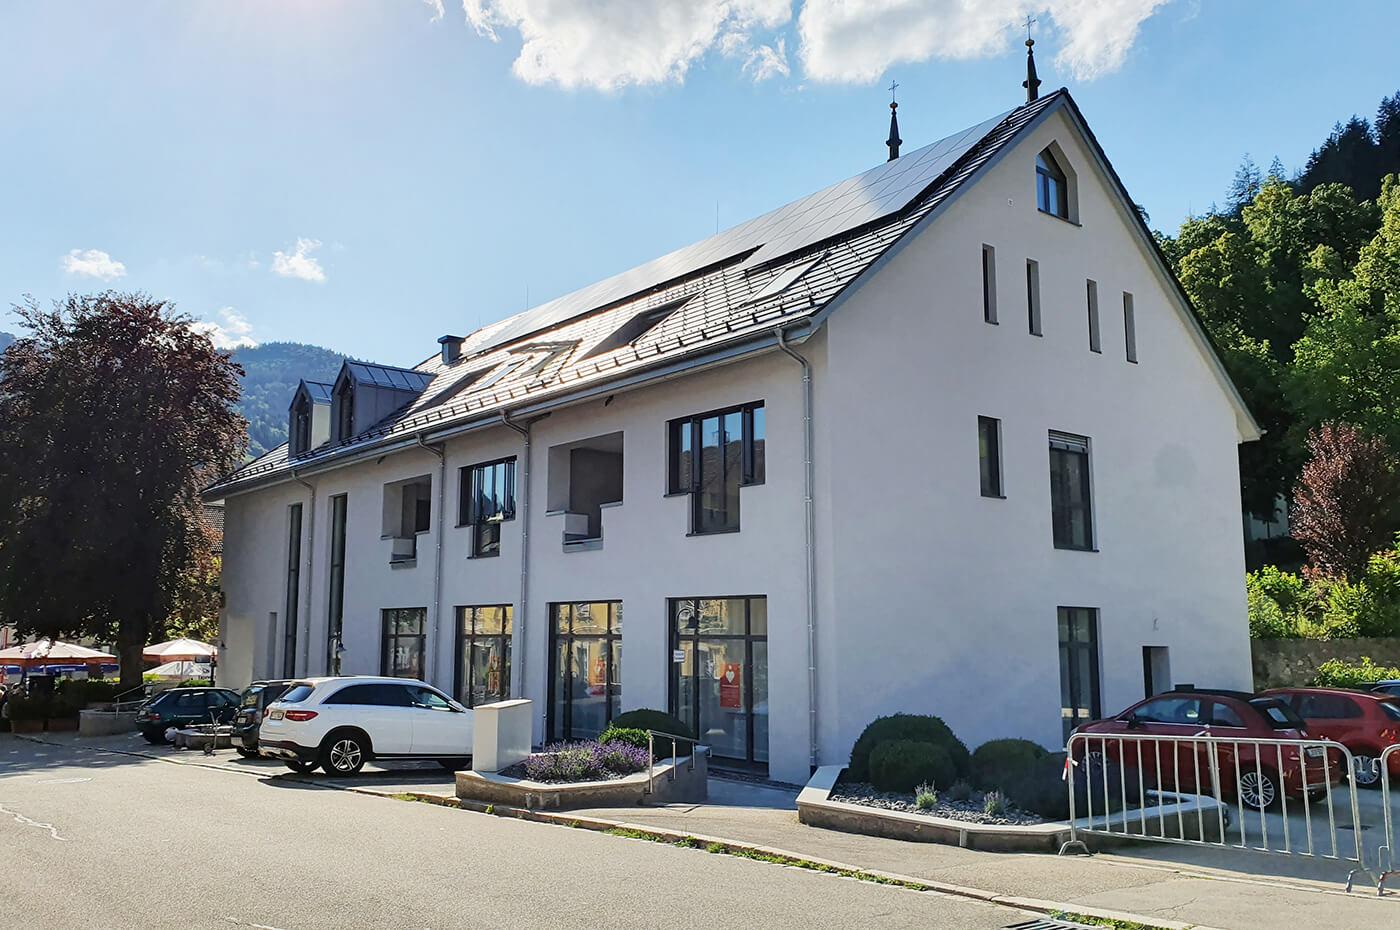 Steildach-Sparkasse-Todtnau-Zumkeller-Holz-Todtmoos